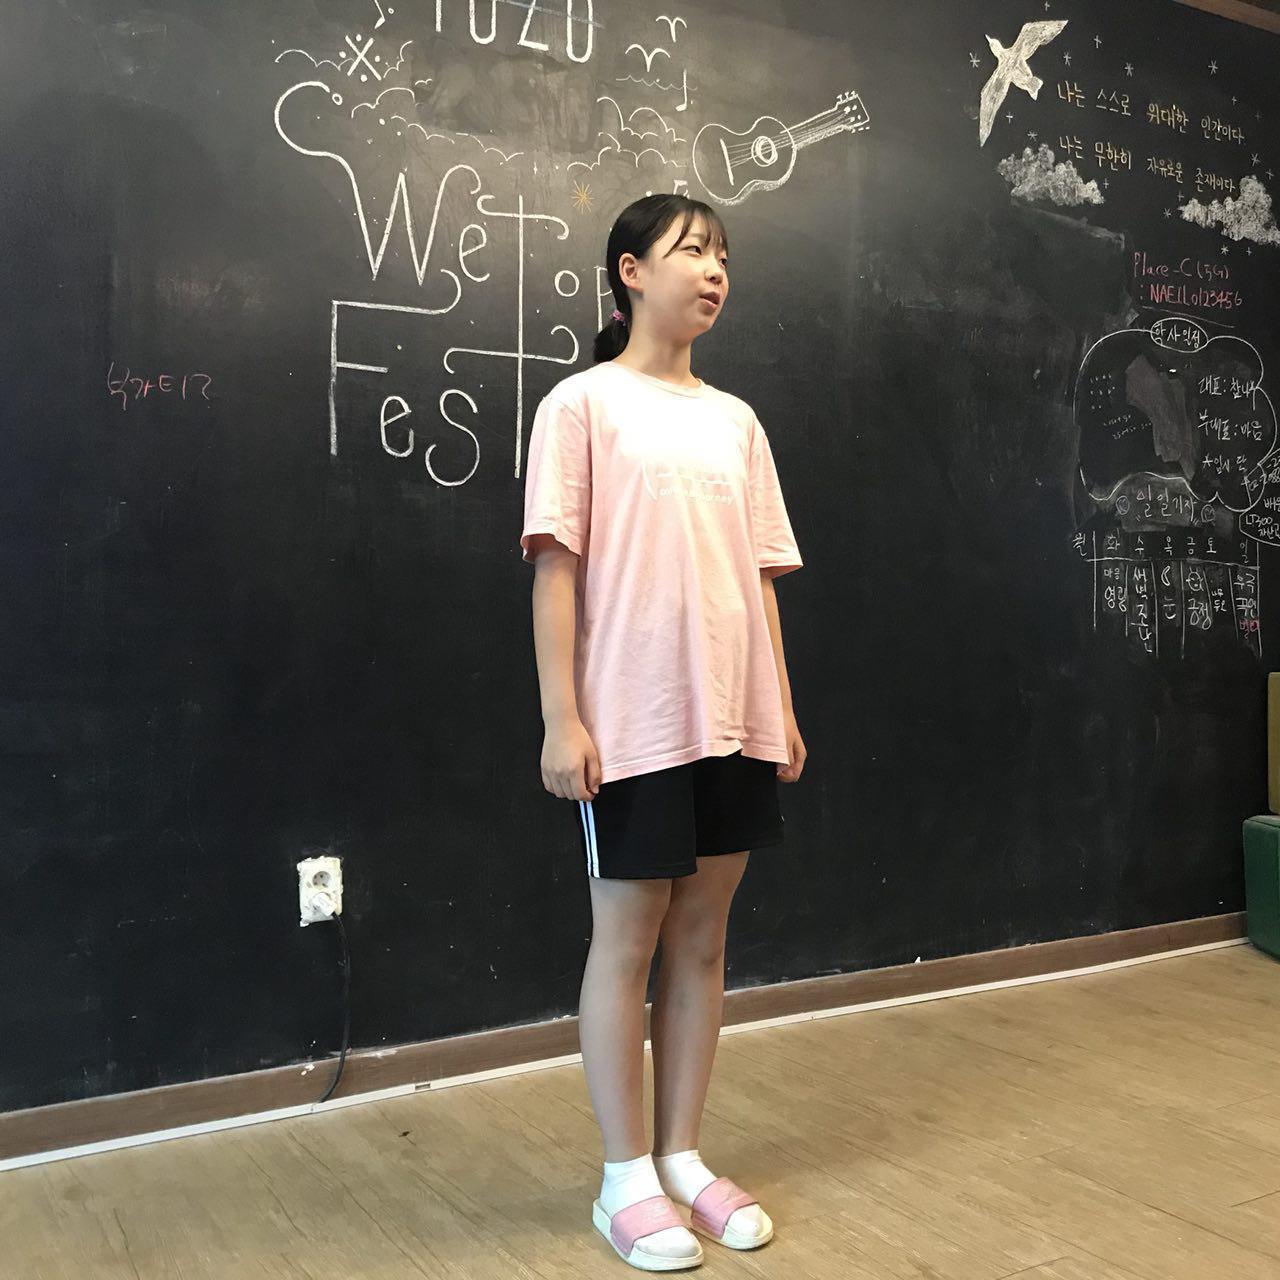 photo_2018-08-10_17-12-00.jpg